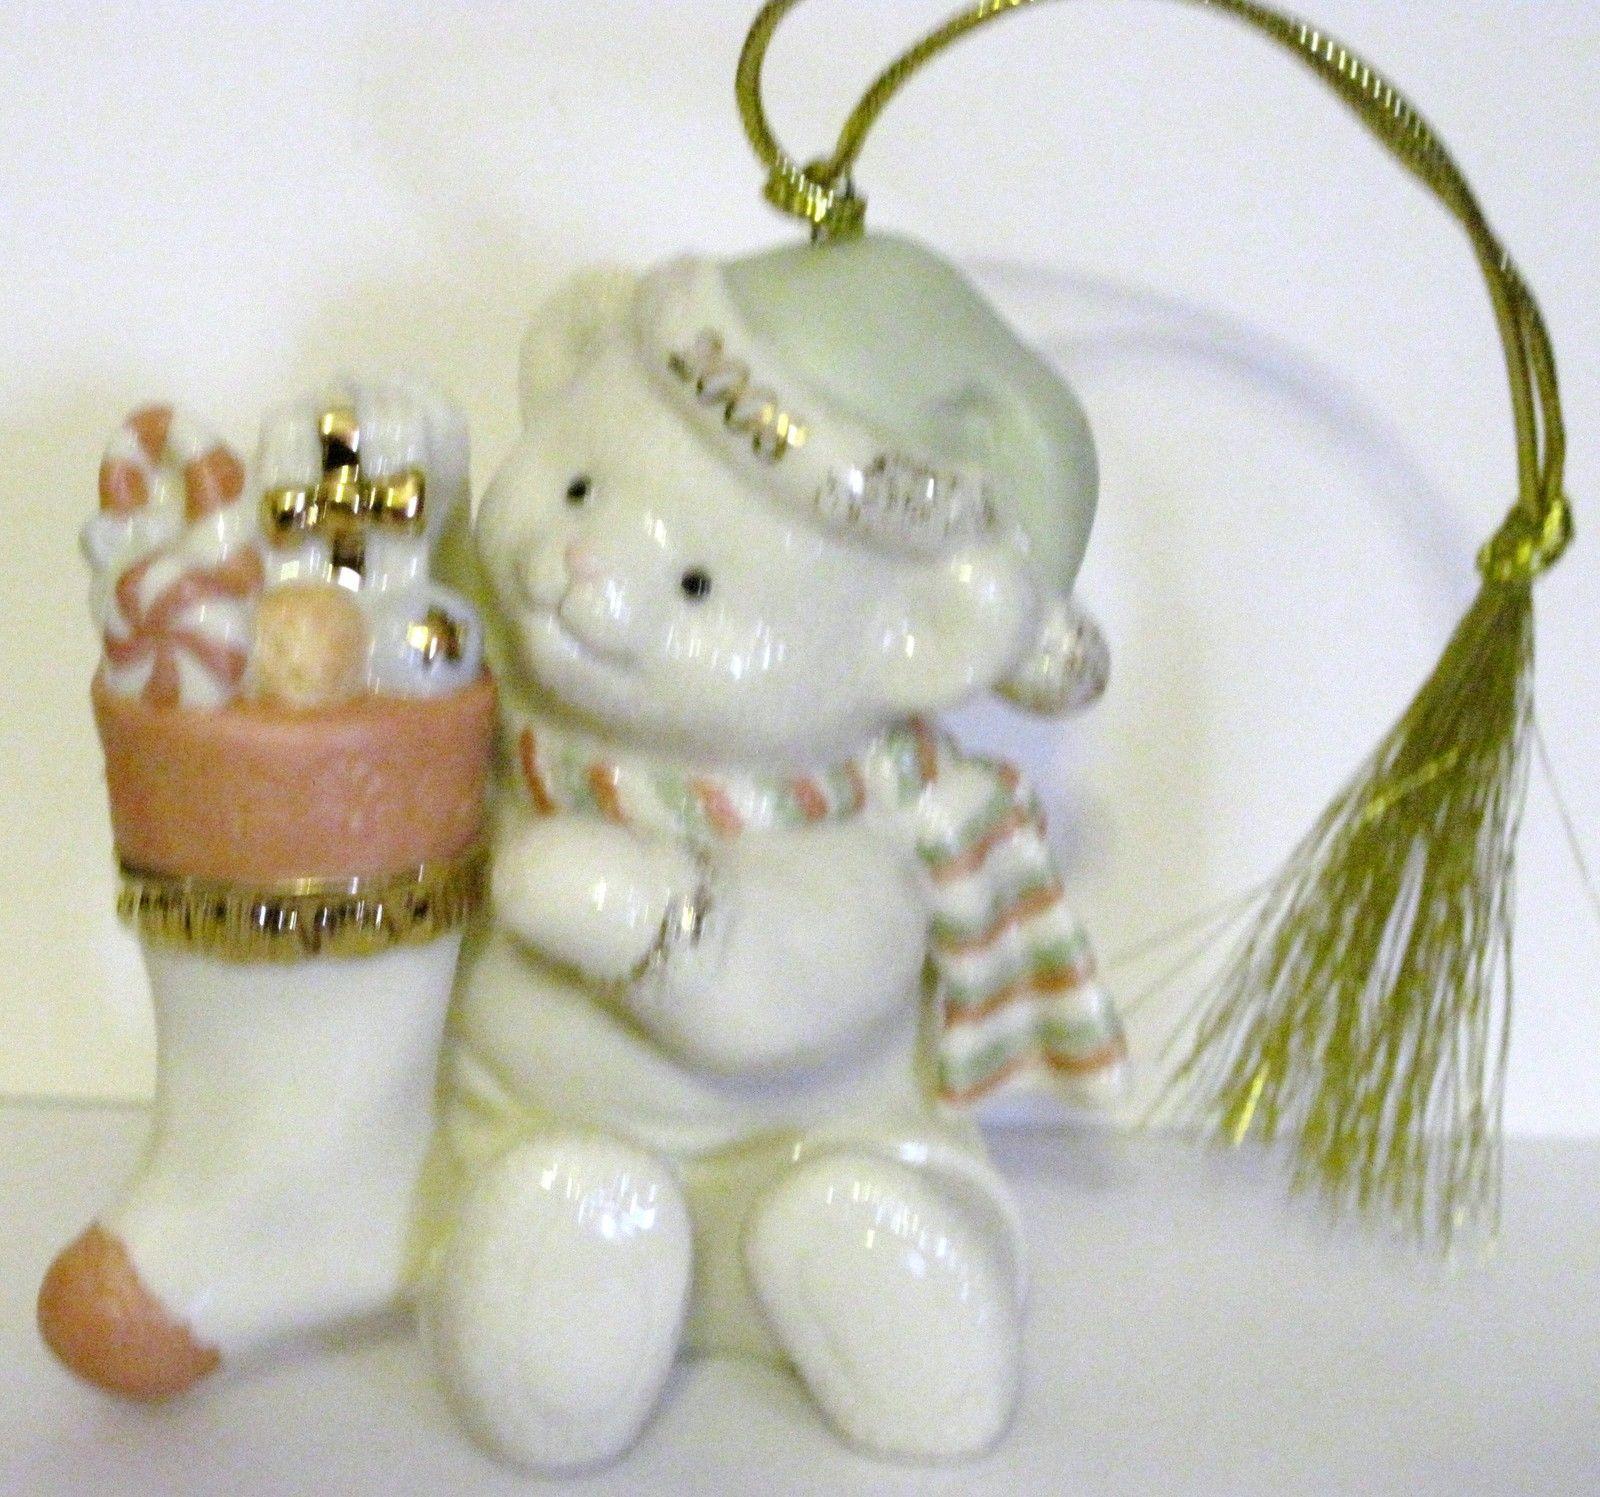 NIB Lenox 2008 Annual Teddy's Special Stocking  Christmas Ornament Bear fine chi image 4